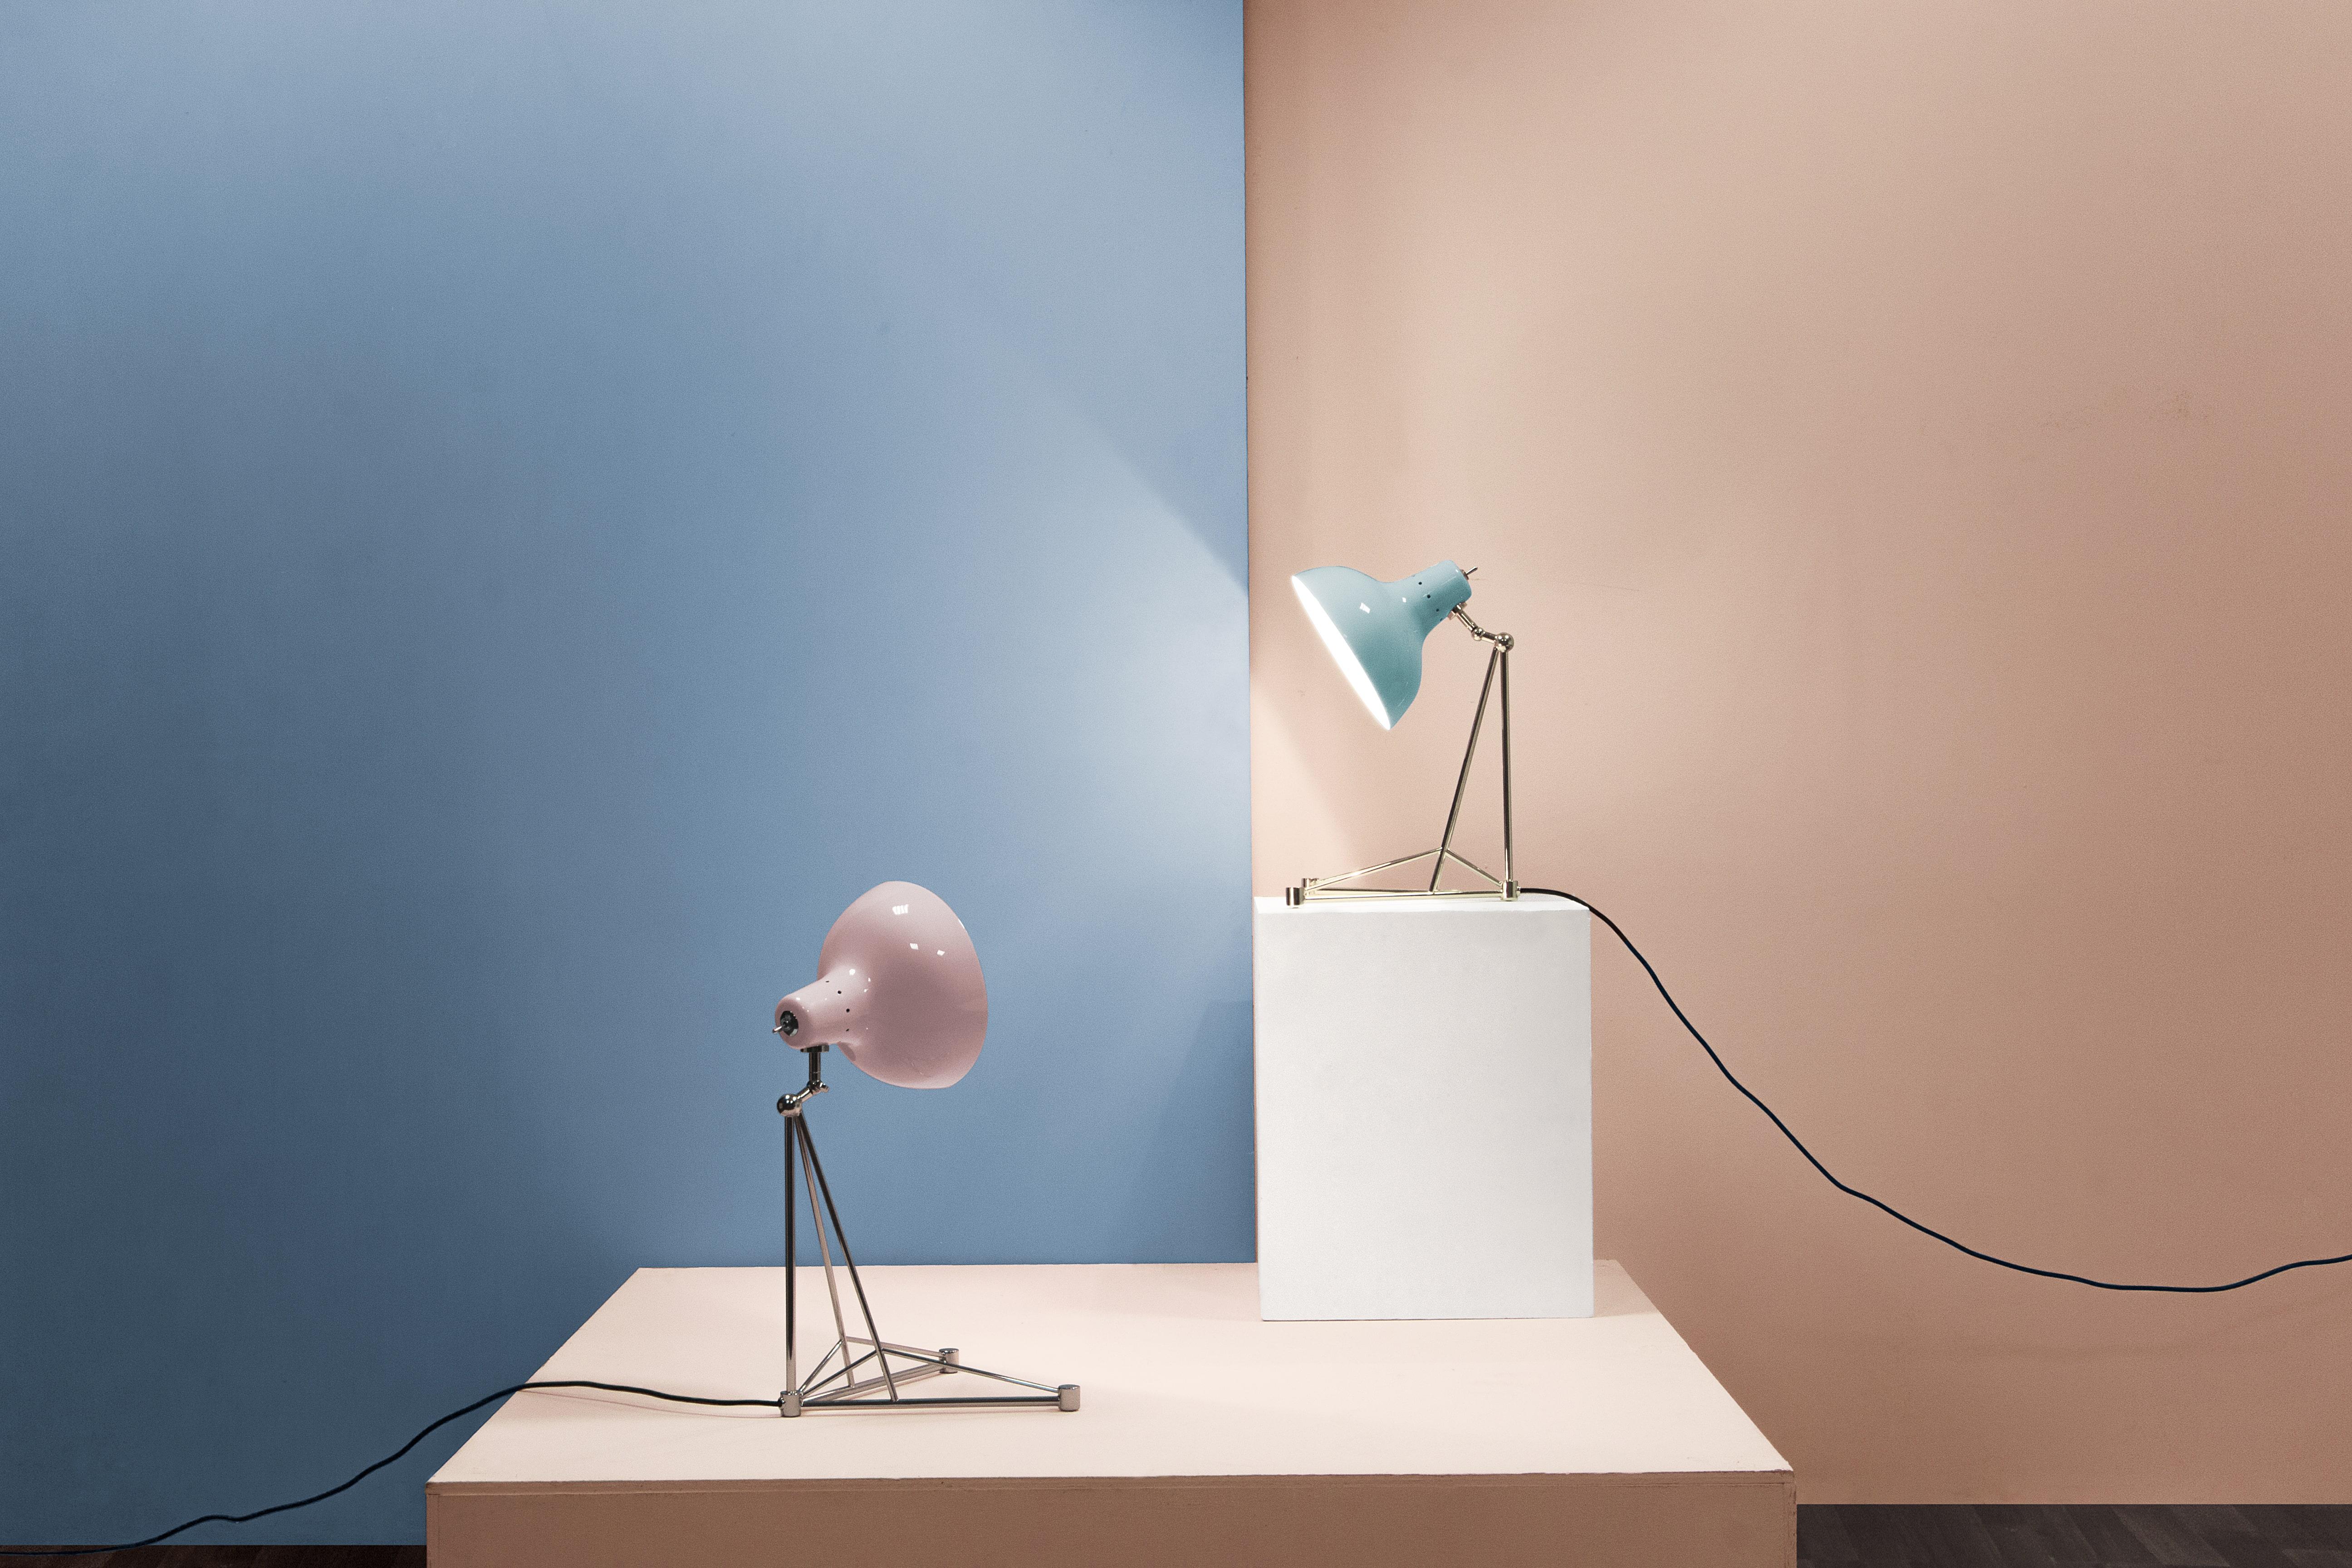 pop art style pop art style Pop Art Style In-Depth Look At Diana Collection! diana table lamp circu magical furniture 1dbc3238695430d0da60b5ea3fa59bc93